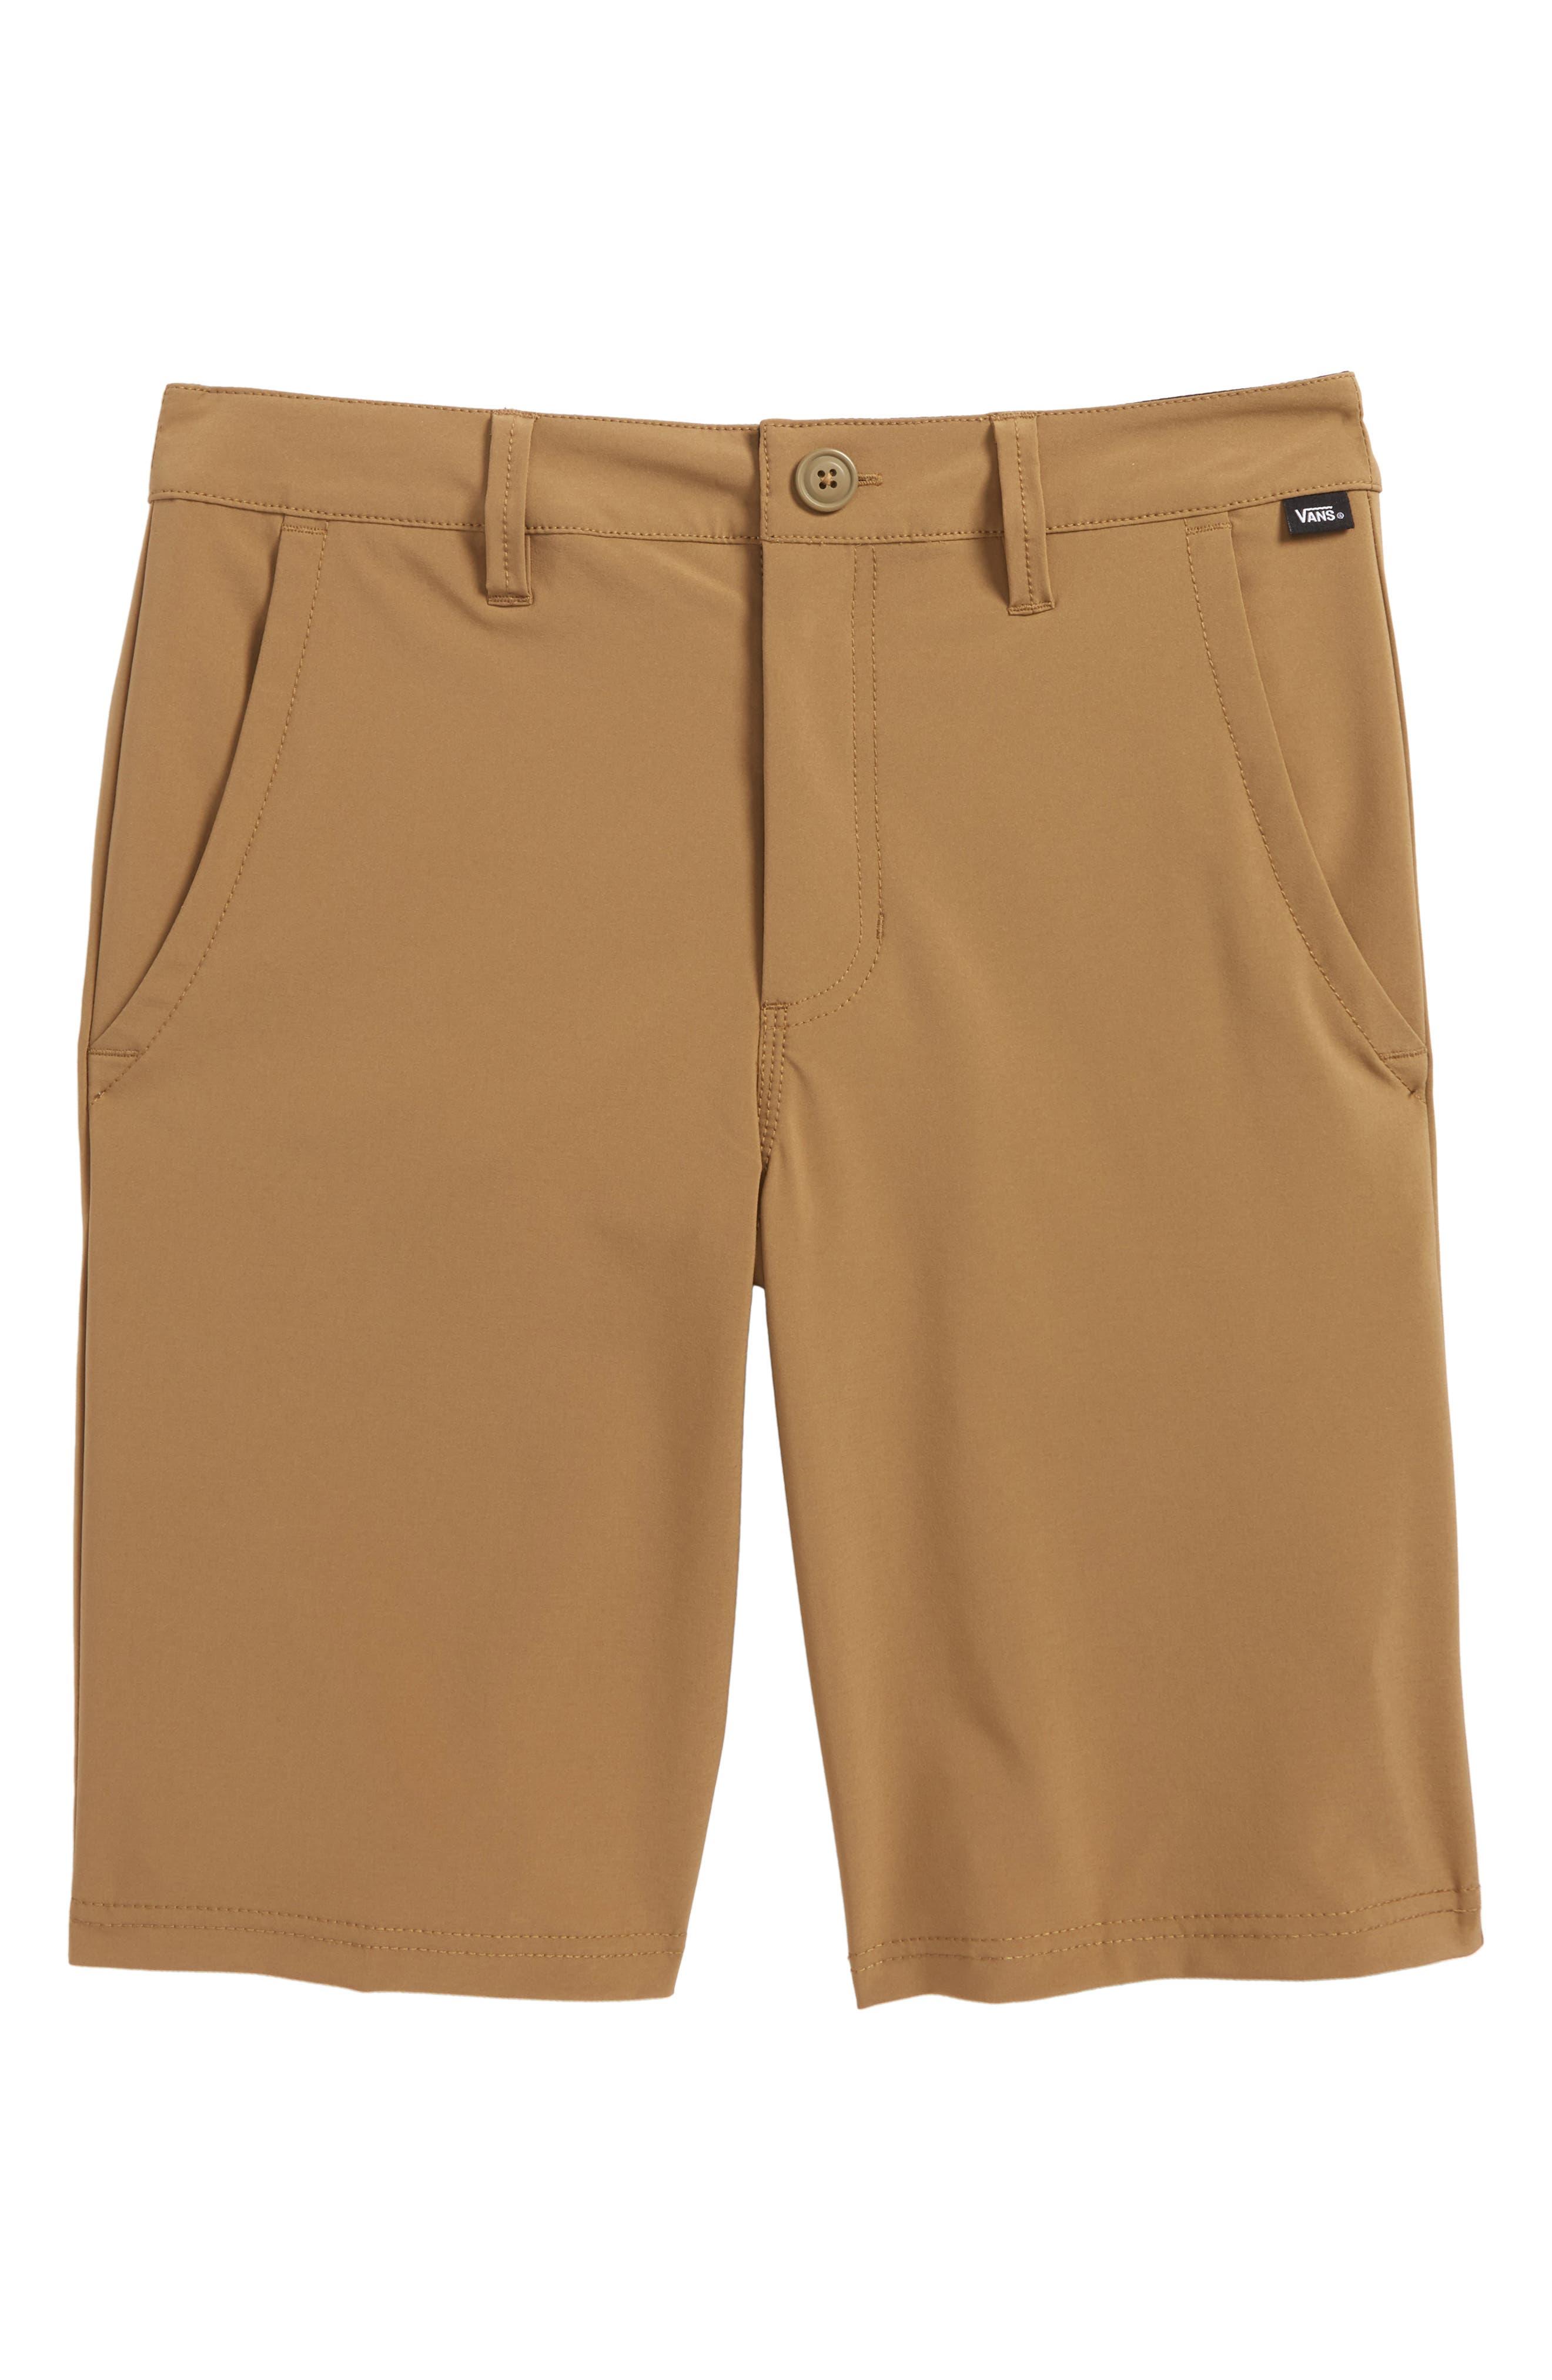 Authentic Decksider Hybrid Shorts,                             Main thumbnail 1, color,                             Dirt